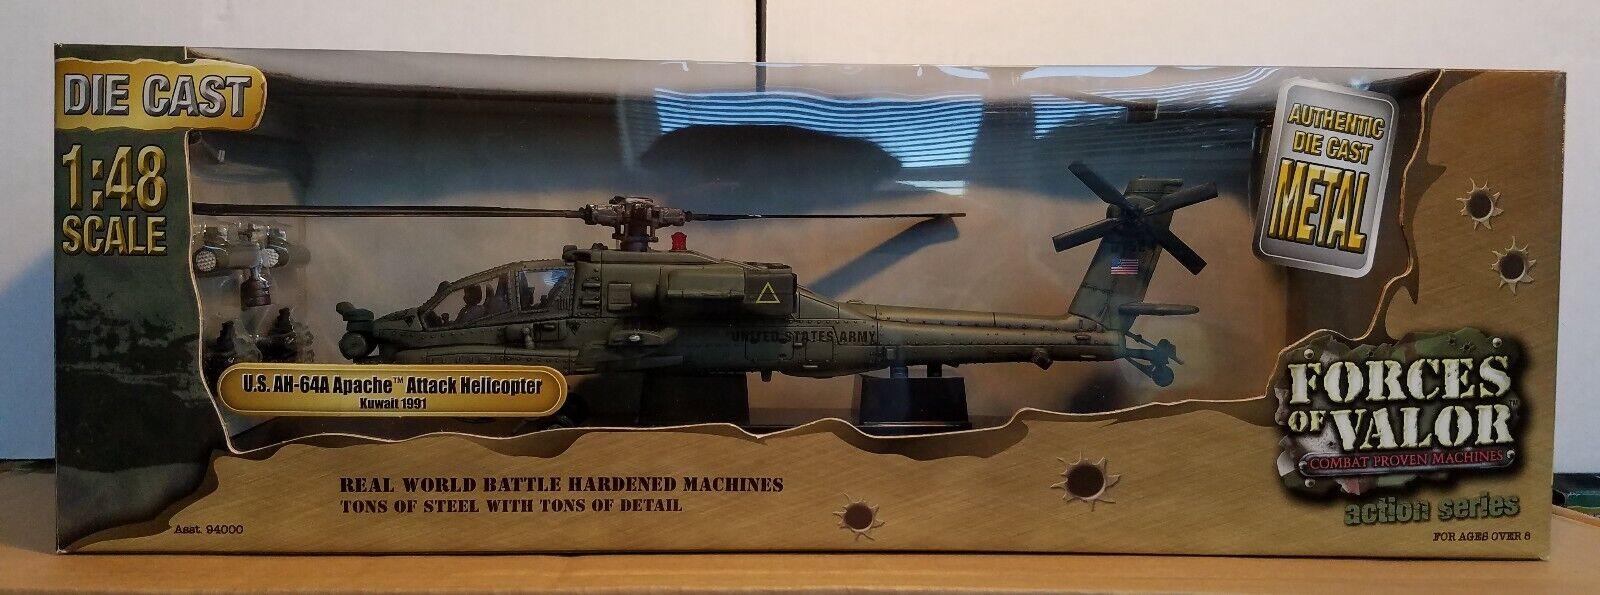 Forces of valor AH-64A Apache ataque helicóptero de EE. UU. escala 1 48